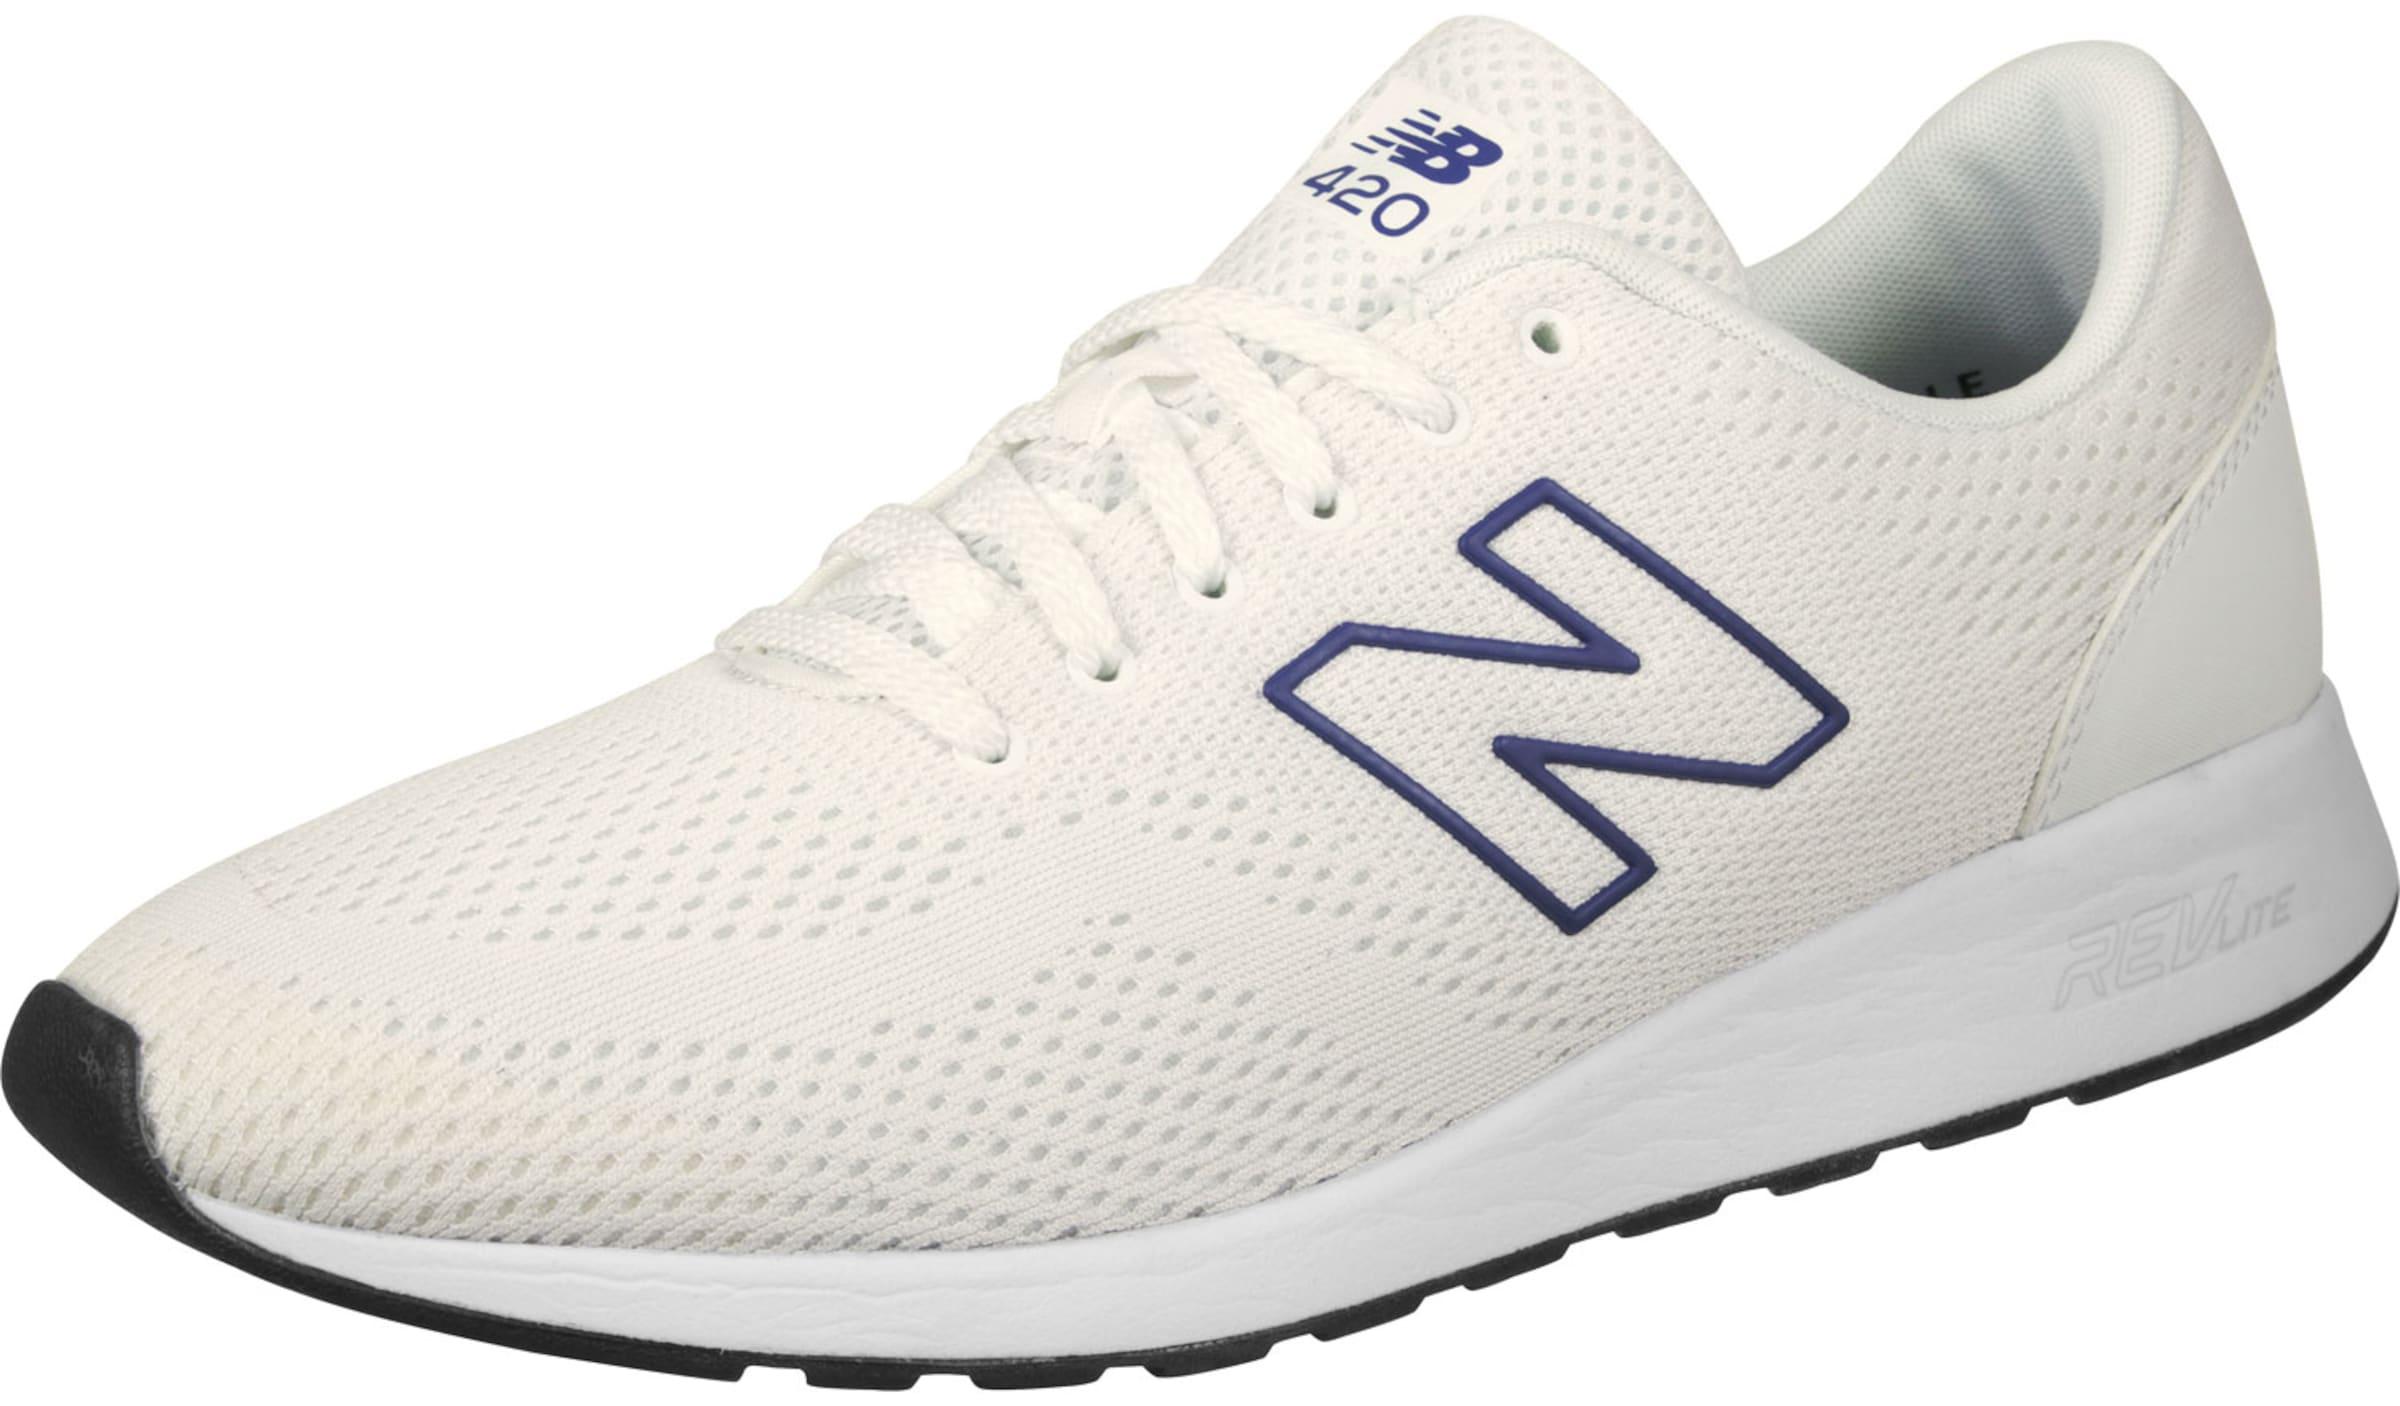 Balance New SaphirWeiß Sneaker In 'mrl420' b6gv7fYy